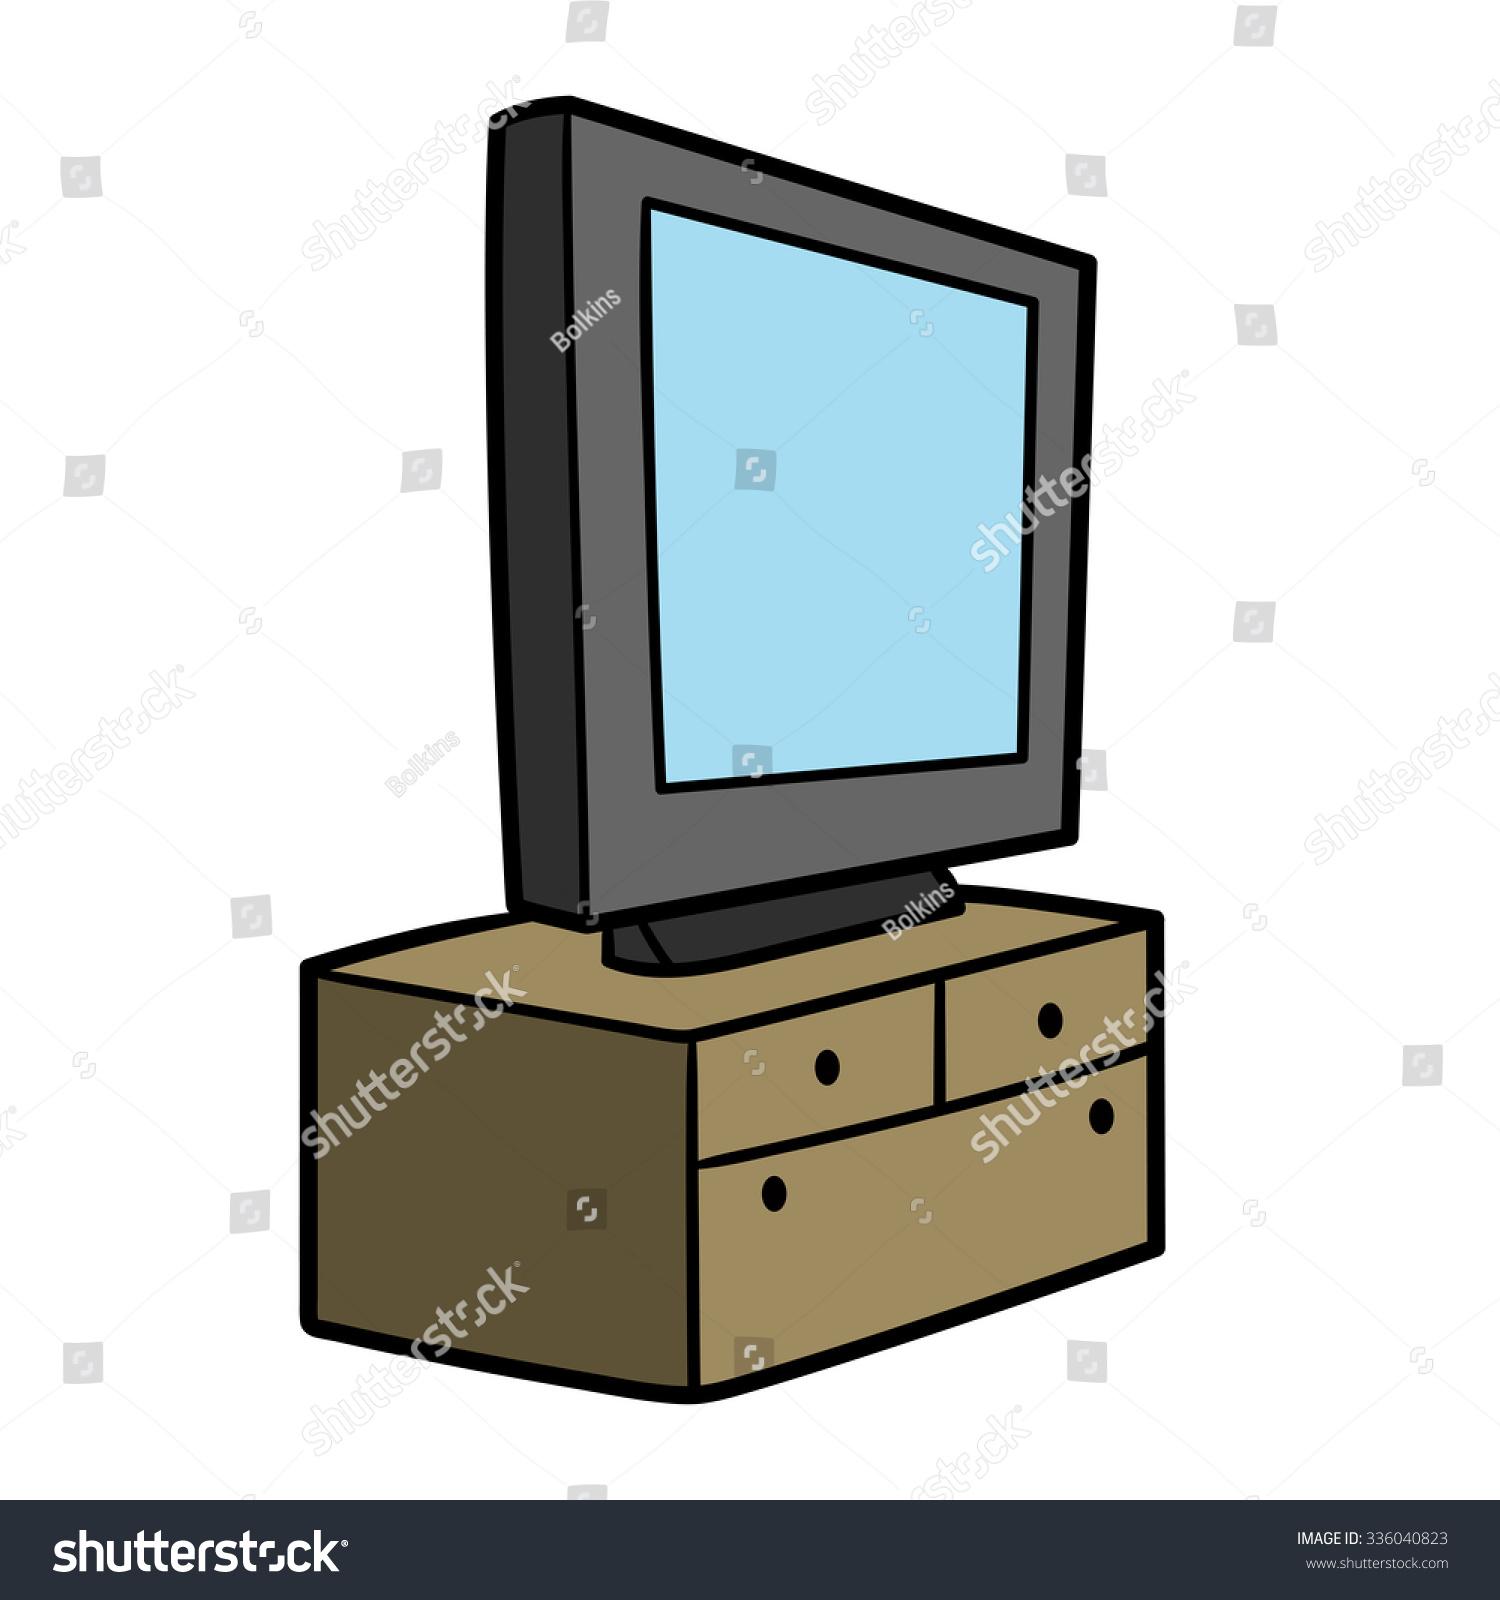 Tv On Commode Stock Vector 336040823 Shutterstock # Commode Tv But